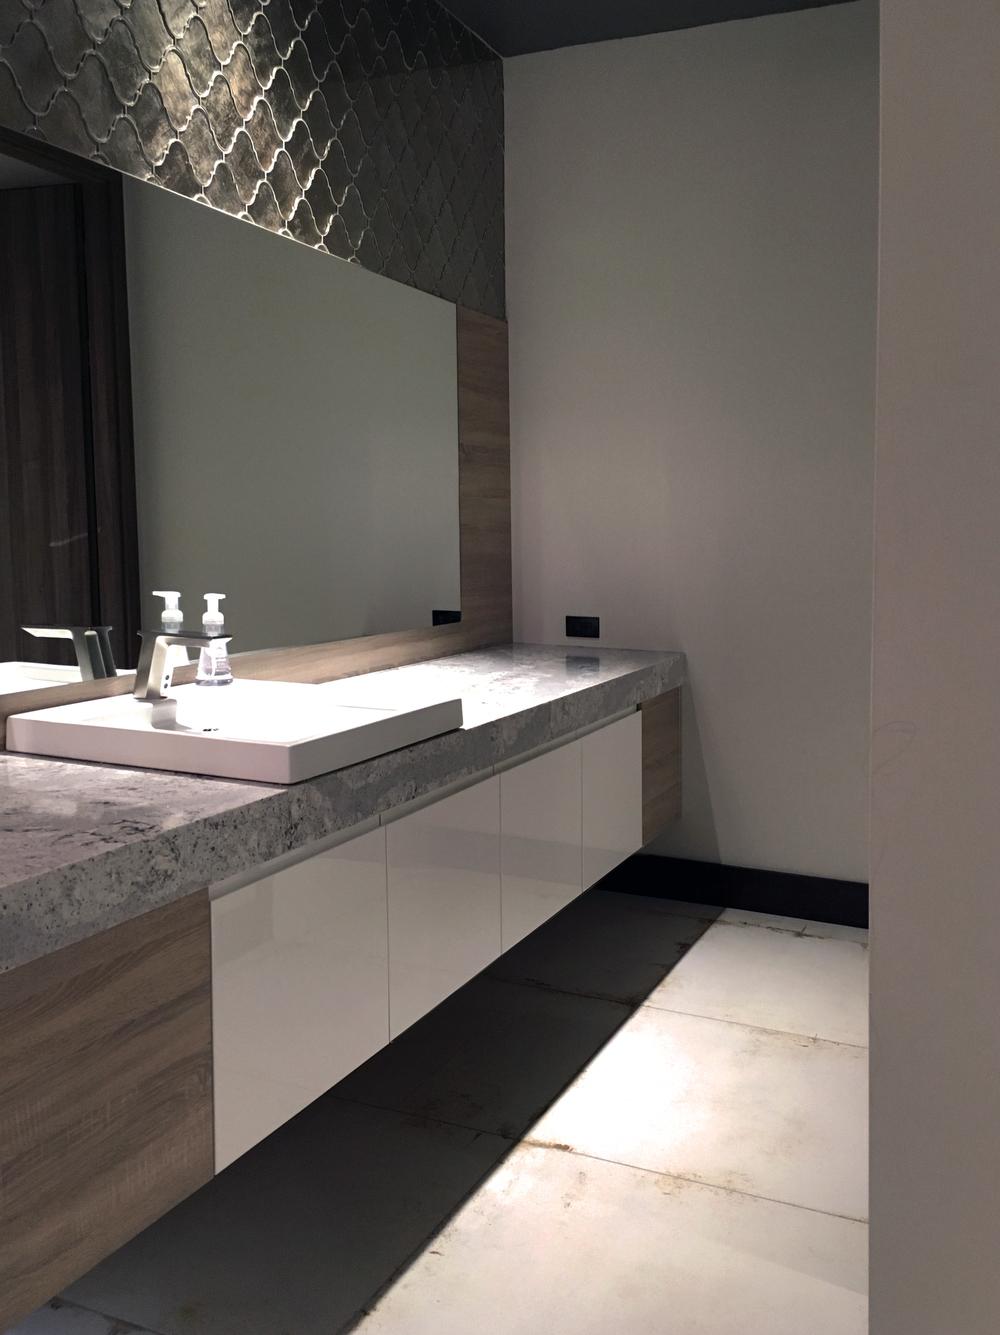 Washroom Bathroom Arabesque quartz harms.jpg